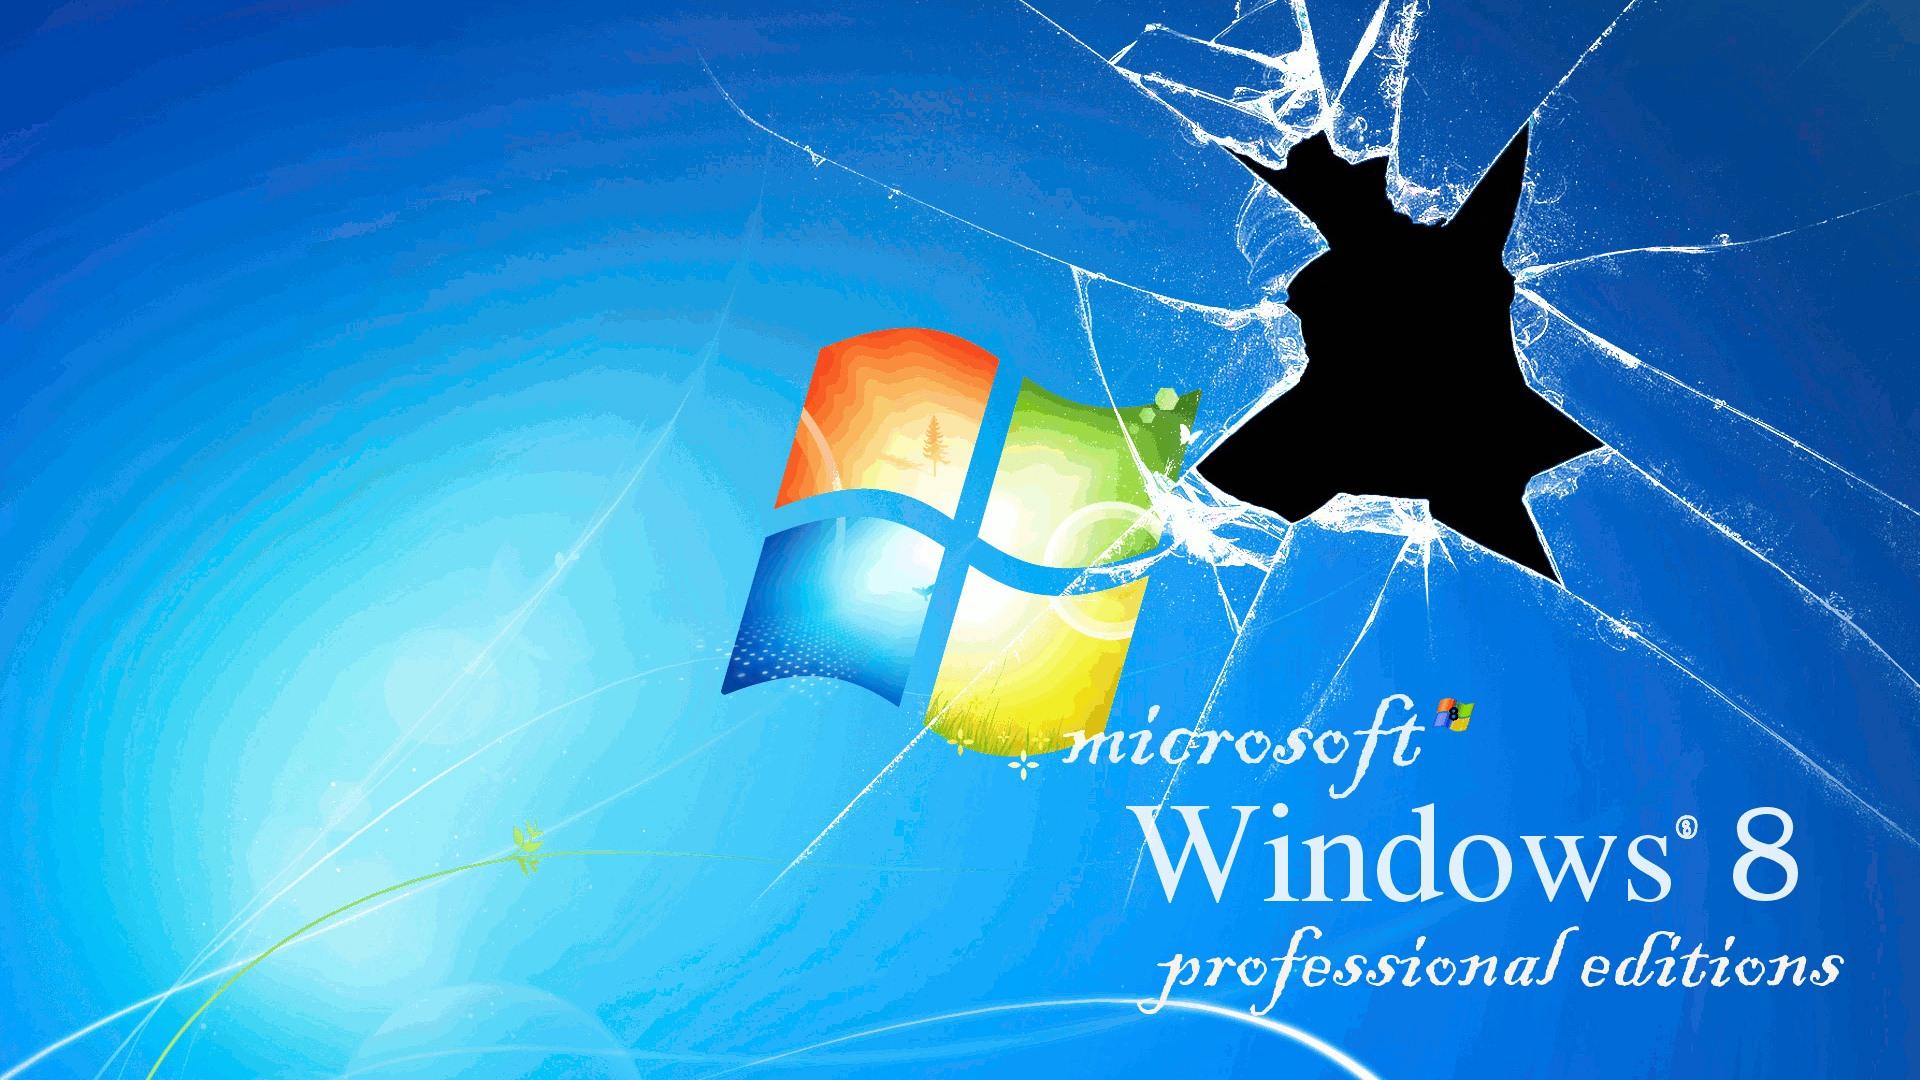 Fond D Ecran Windows 8 Theme 2 3 1920x1080 Fond D Ecran Telecharger Fond D Ecran Windows 8 Theme 2 Systeme Fond D Ecran V3 Fond D Ecran Du Site